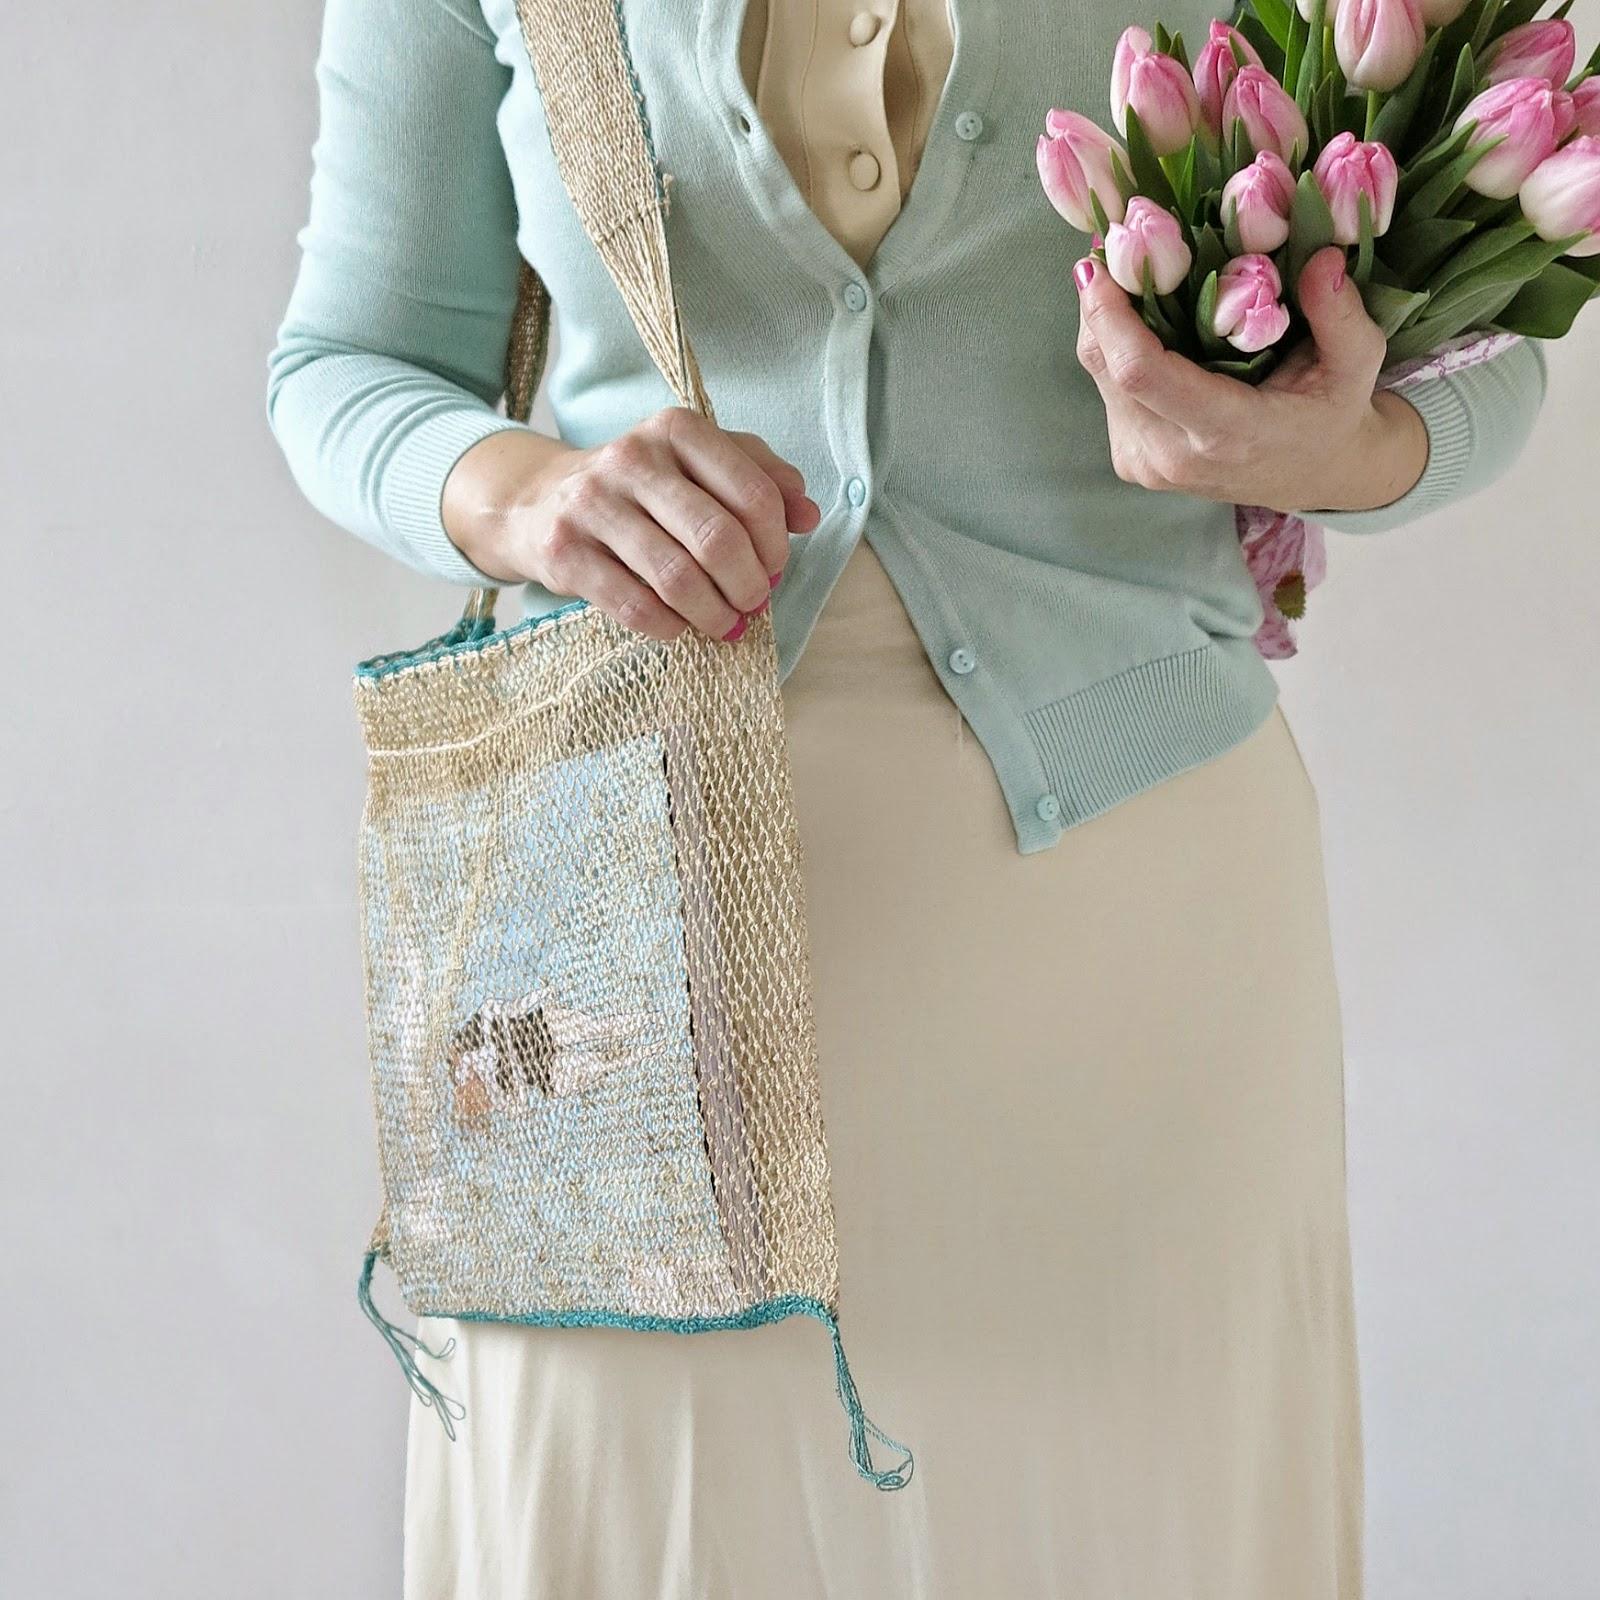 ByHaafner, Nature Bag, kudzu, JungleVine, tulips